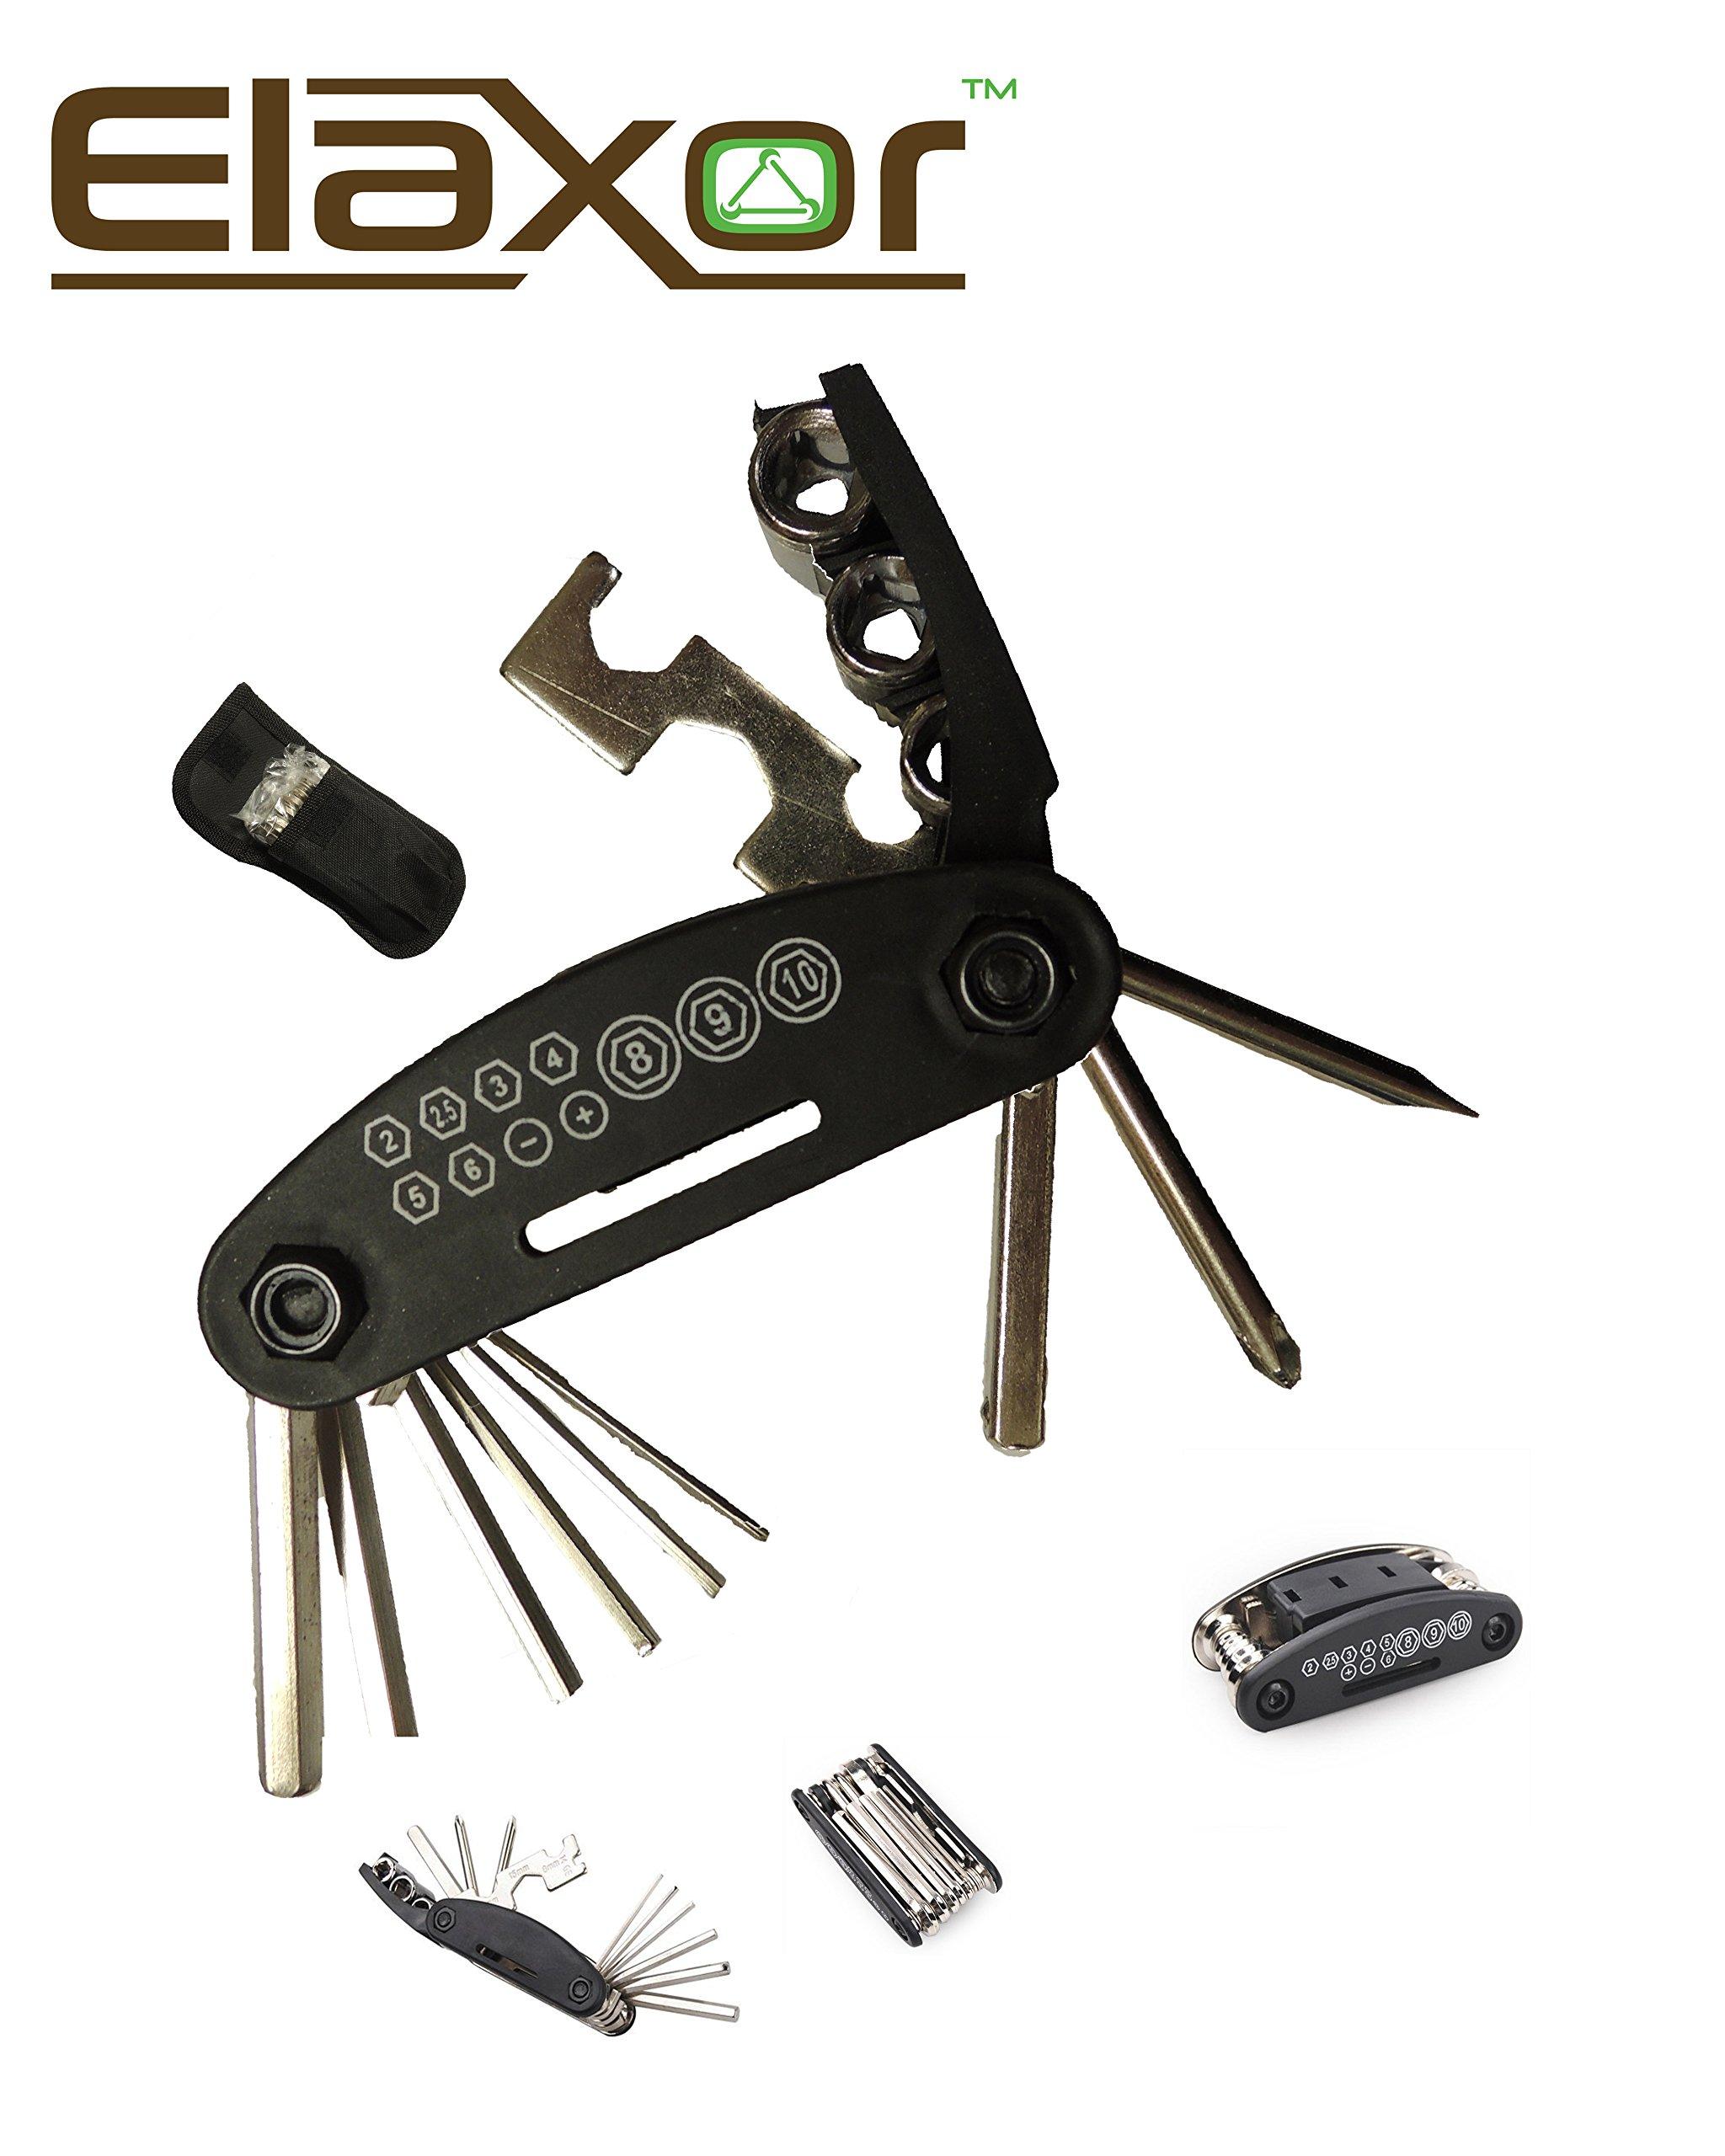 Elaxor™ 16-Multi Function Bike, Bicycle, Cycling Mechanic Tool Kit Set. For Repairing Bike Bicycle Fast, Easy & Efficient